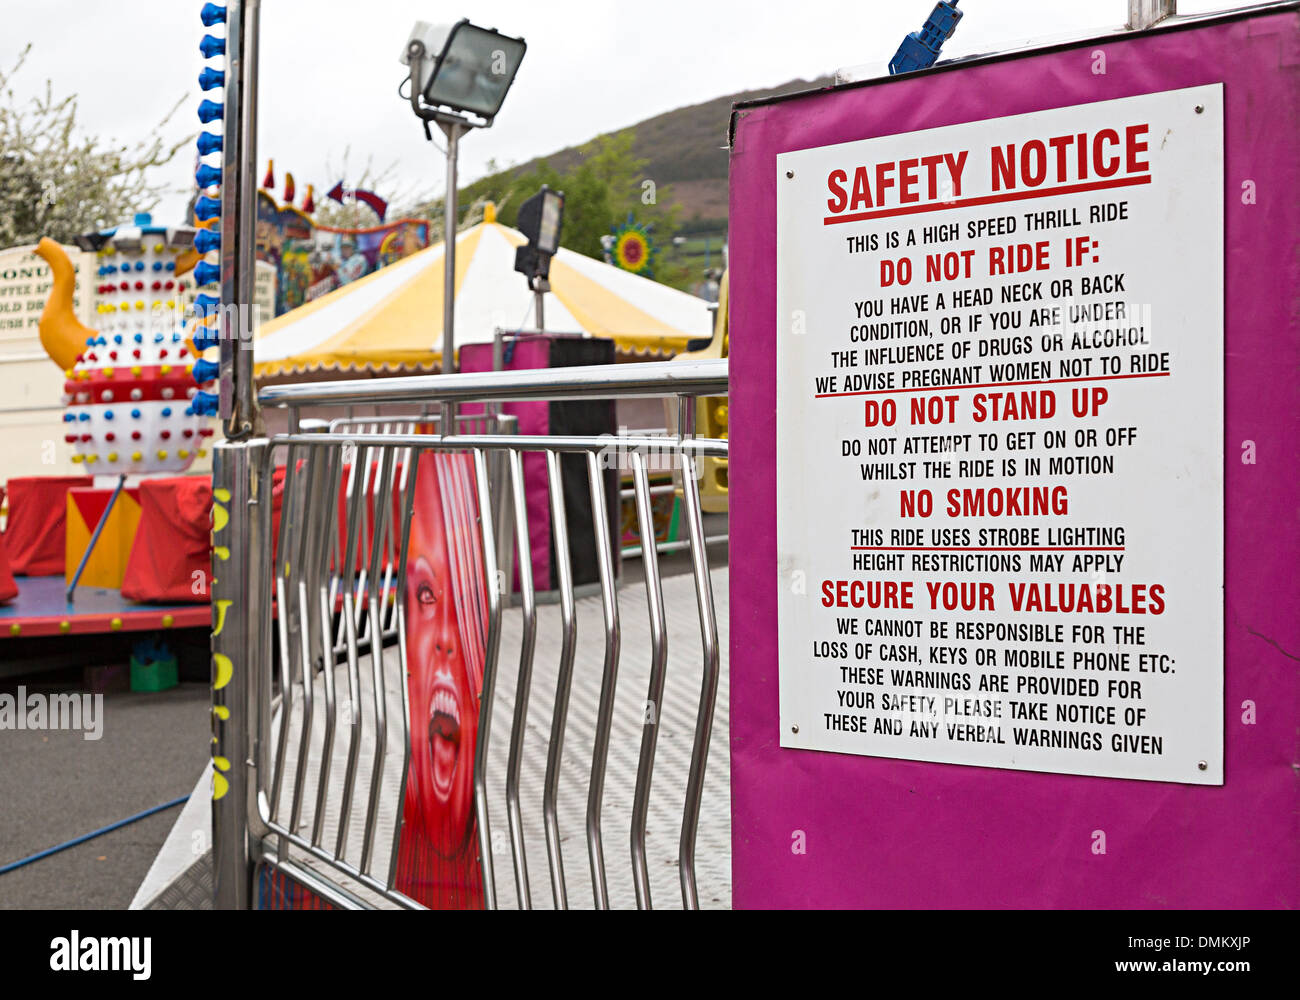 Warning medical sign on fairground thrill ride, UK - Stock Image